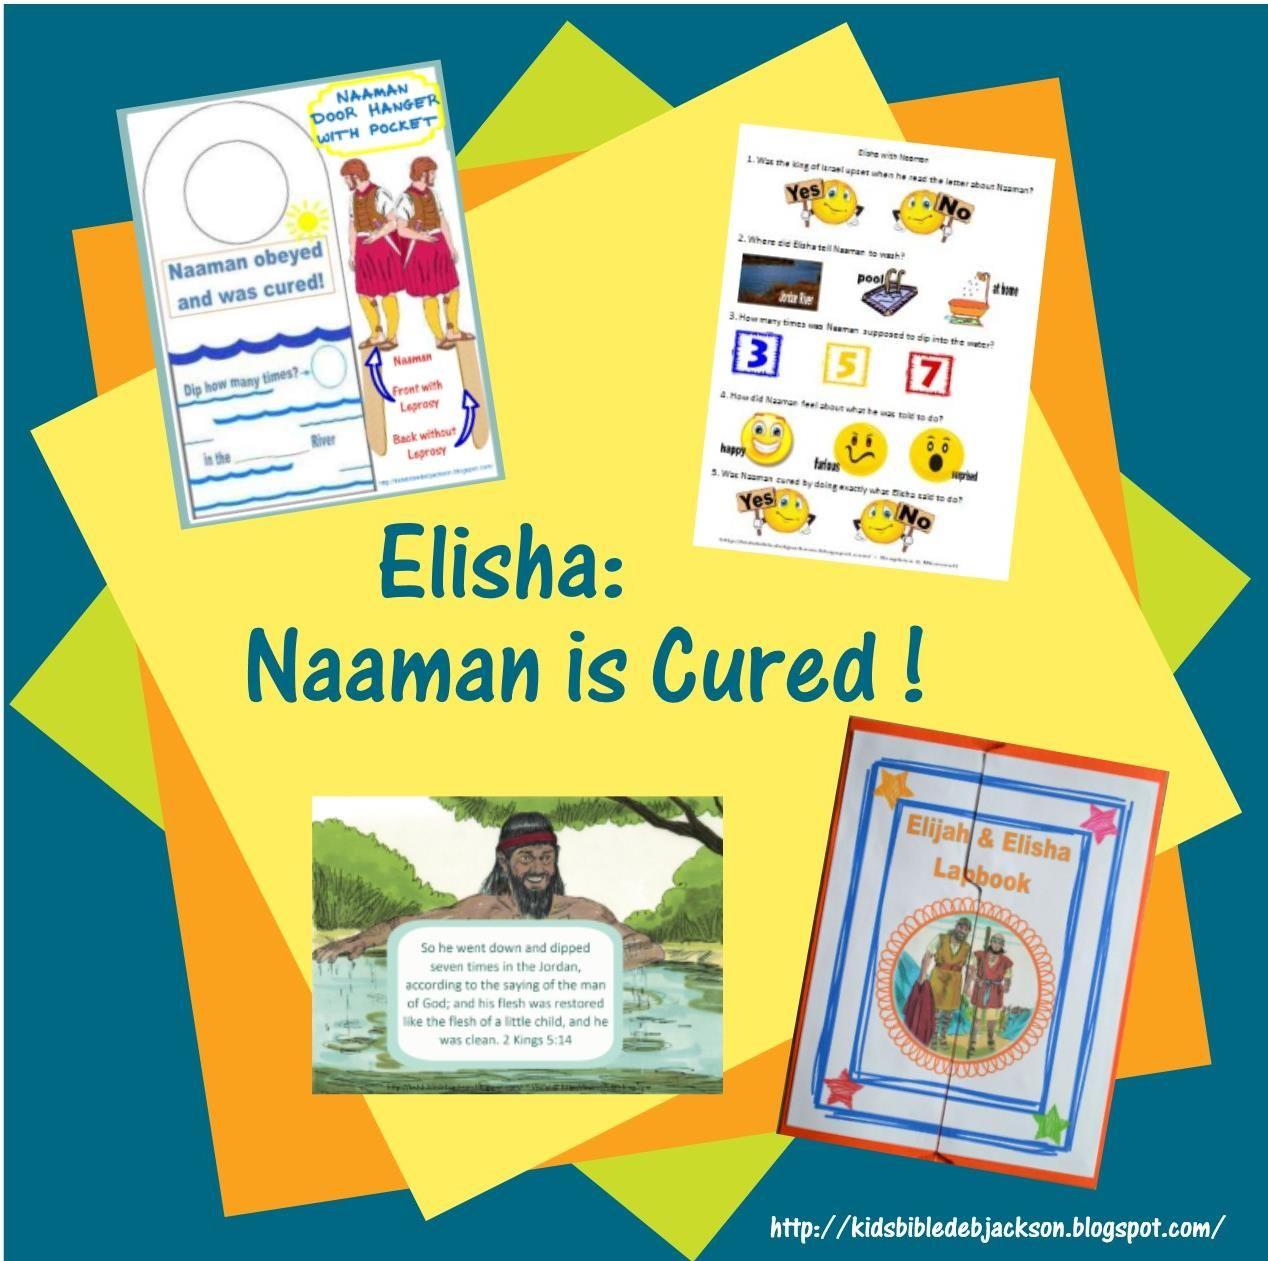 http://kidsbibledebjackson.blogspot.com/2014/04/elisha-naaman.html ...